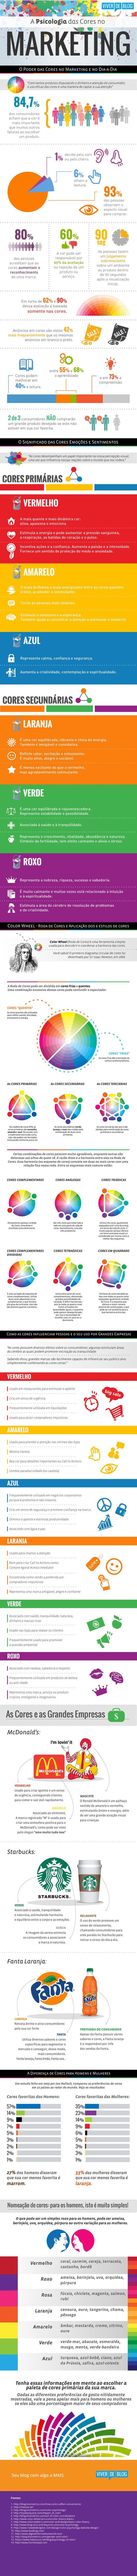 yyl3j1-infografico-psicologia-cores-1000